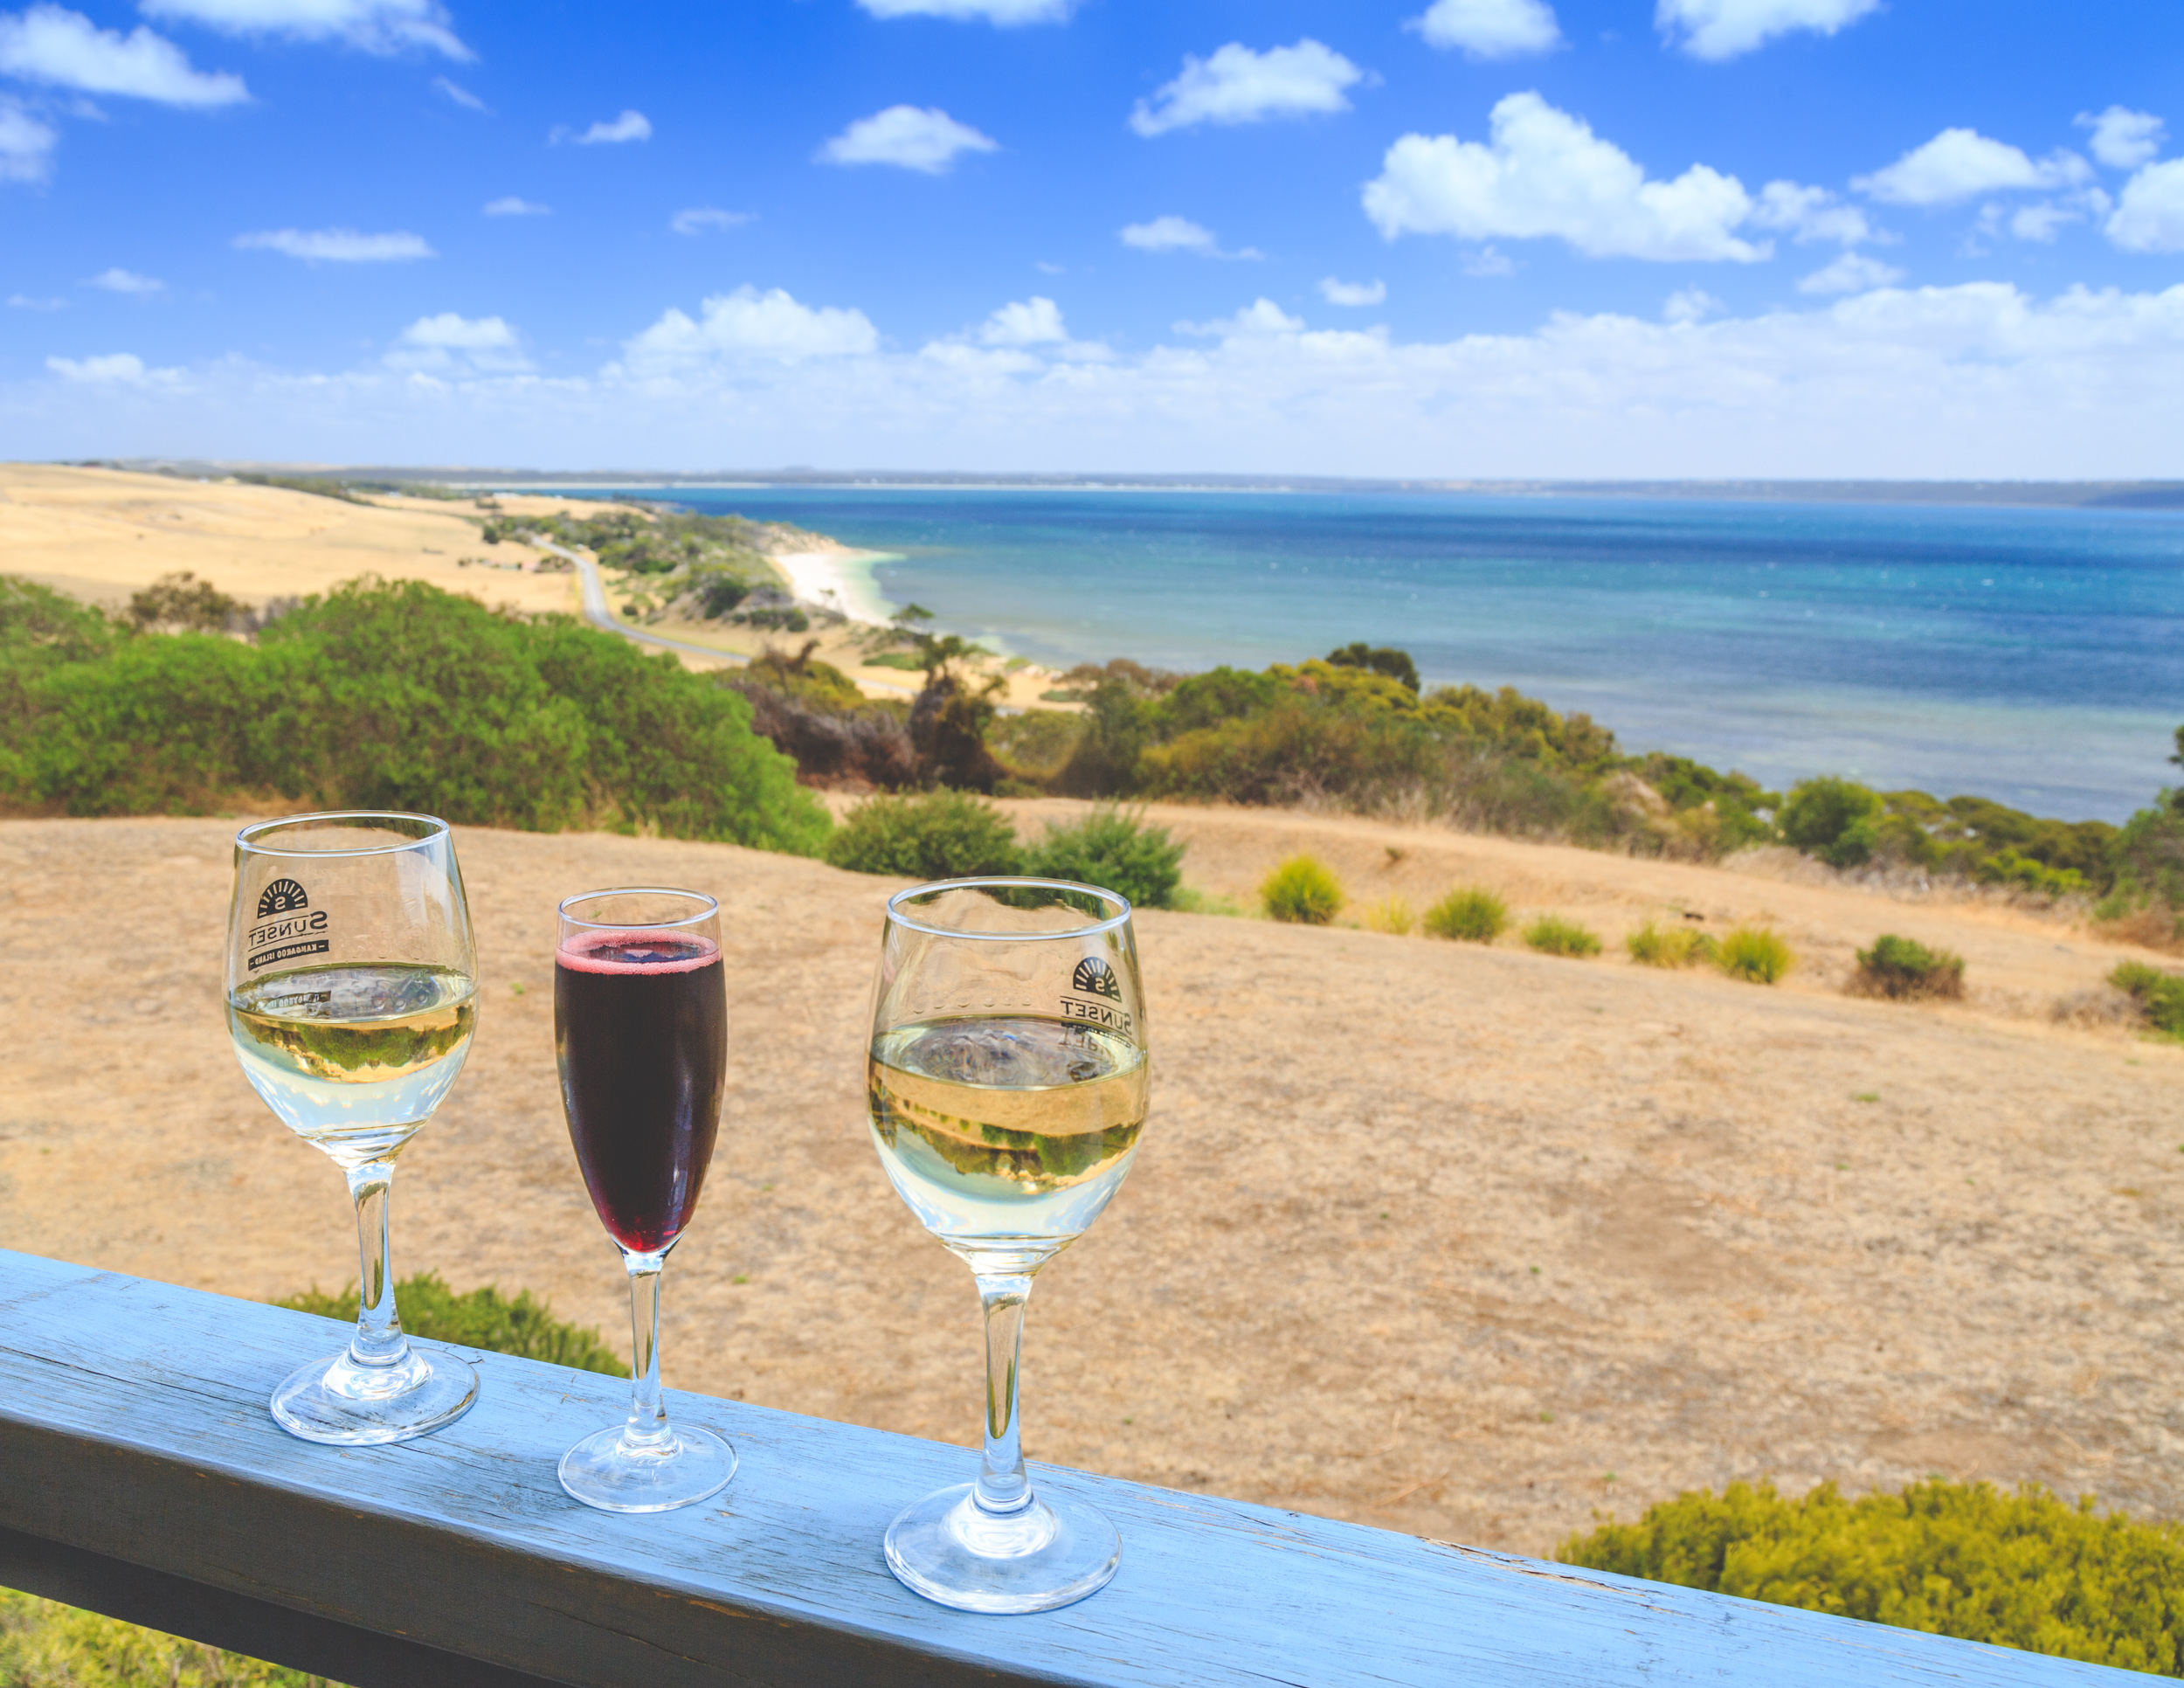 How to get to Kangaroo Island: Sunset Food & Wine